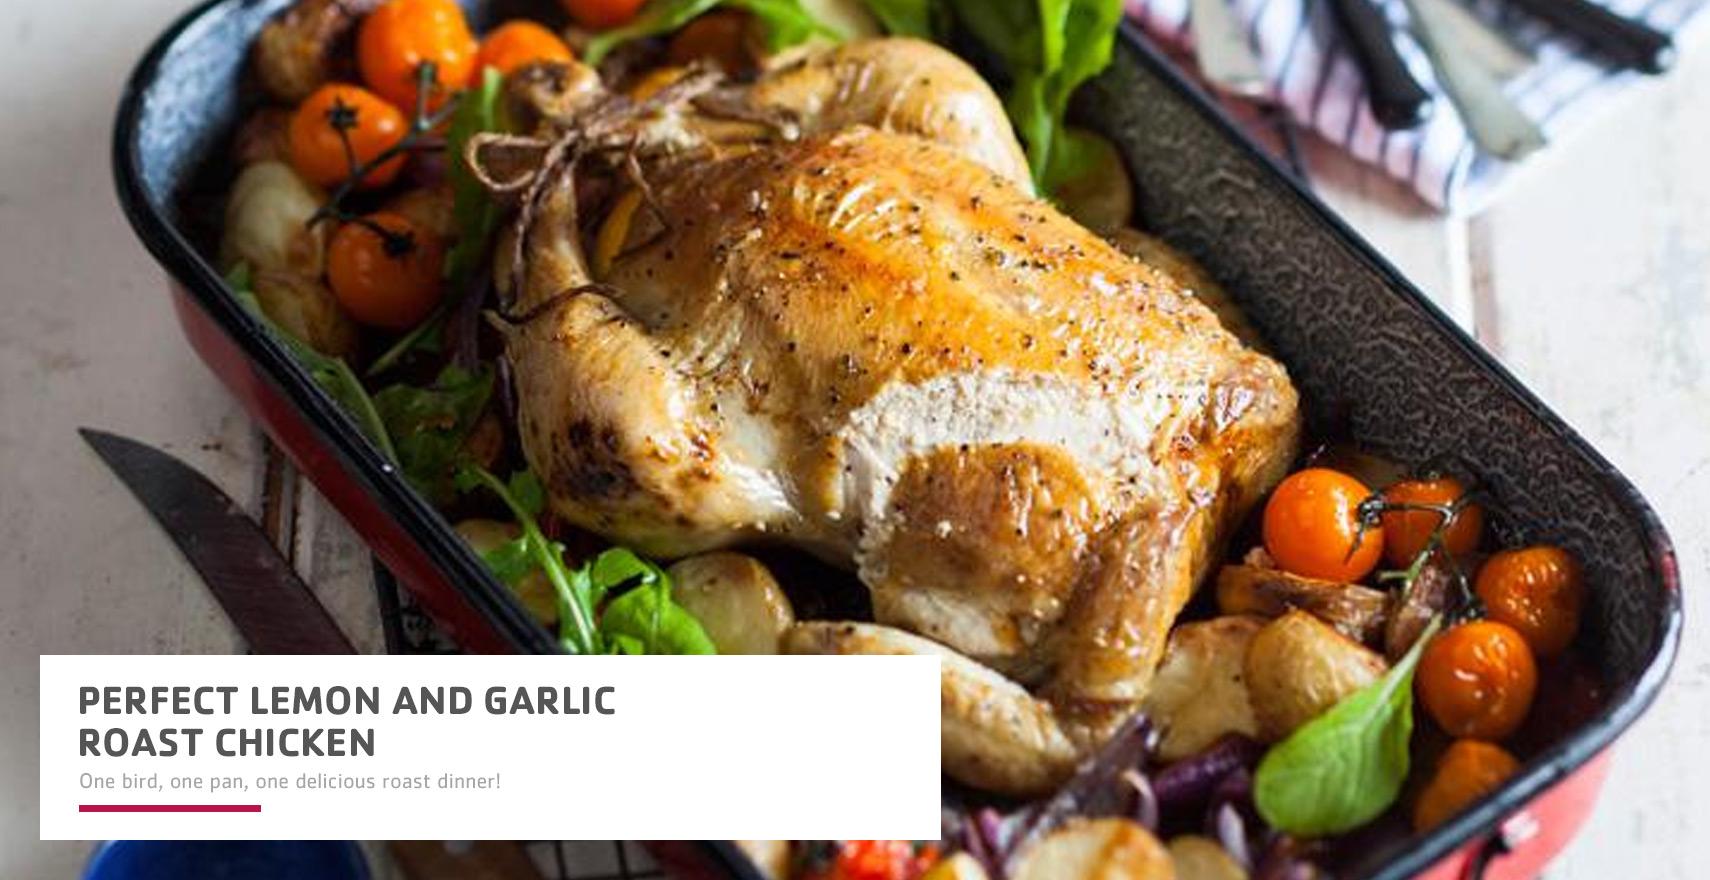 perfect-lemon-and-garlic-roast-chicken.jpg